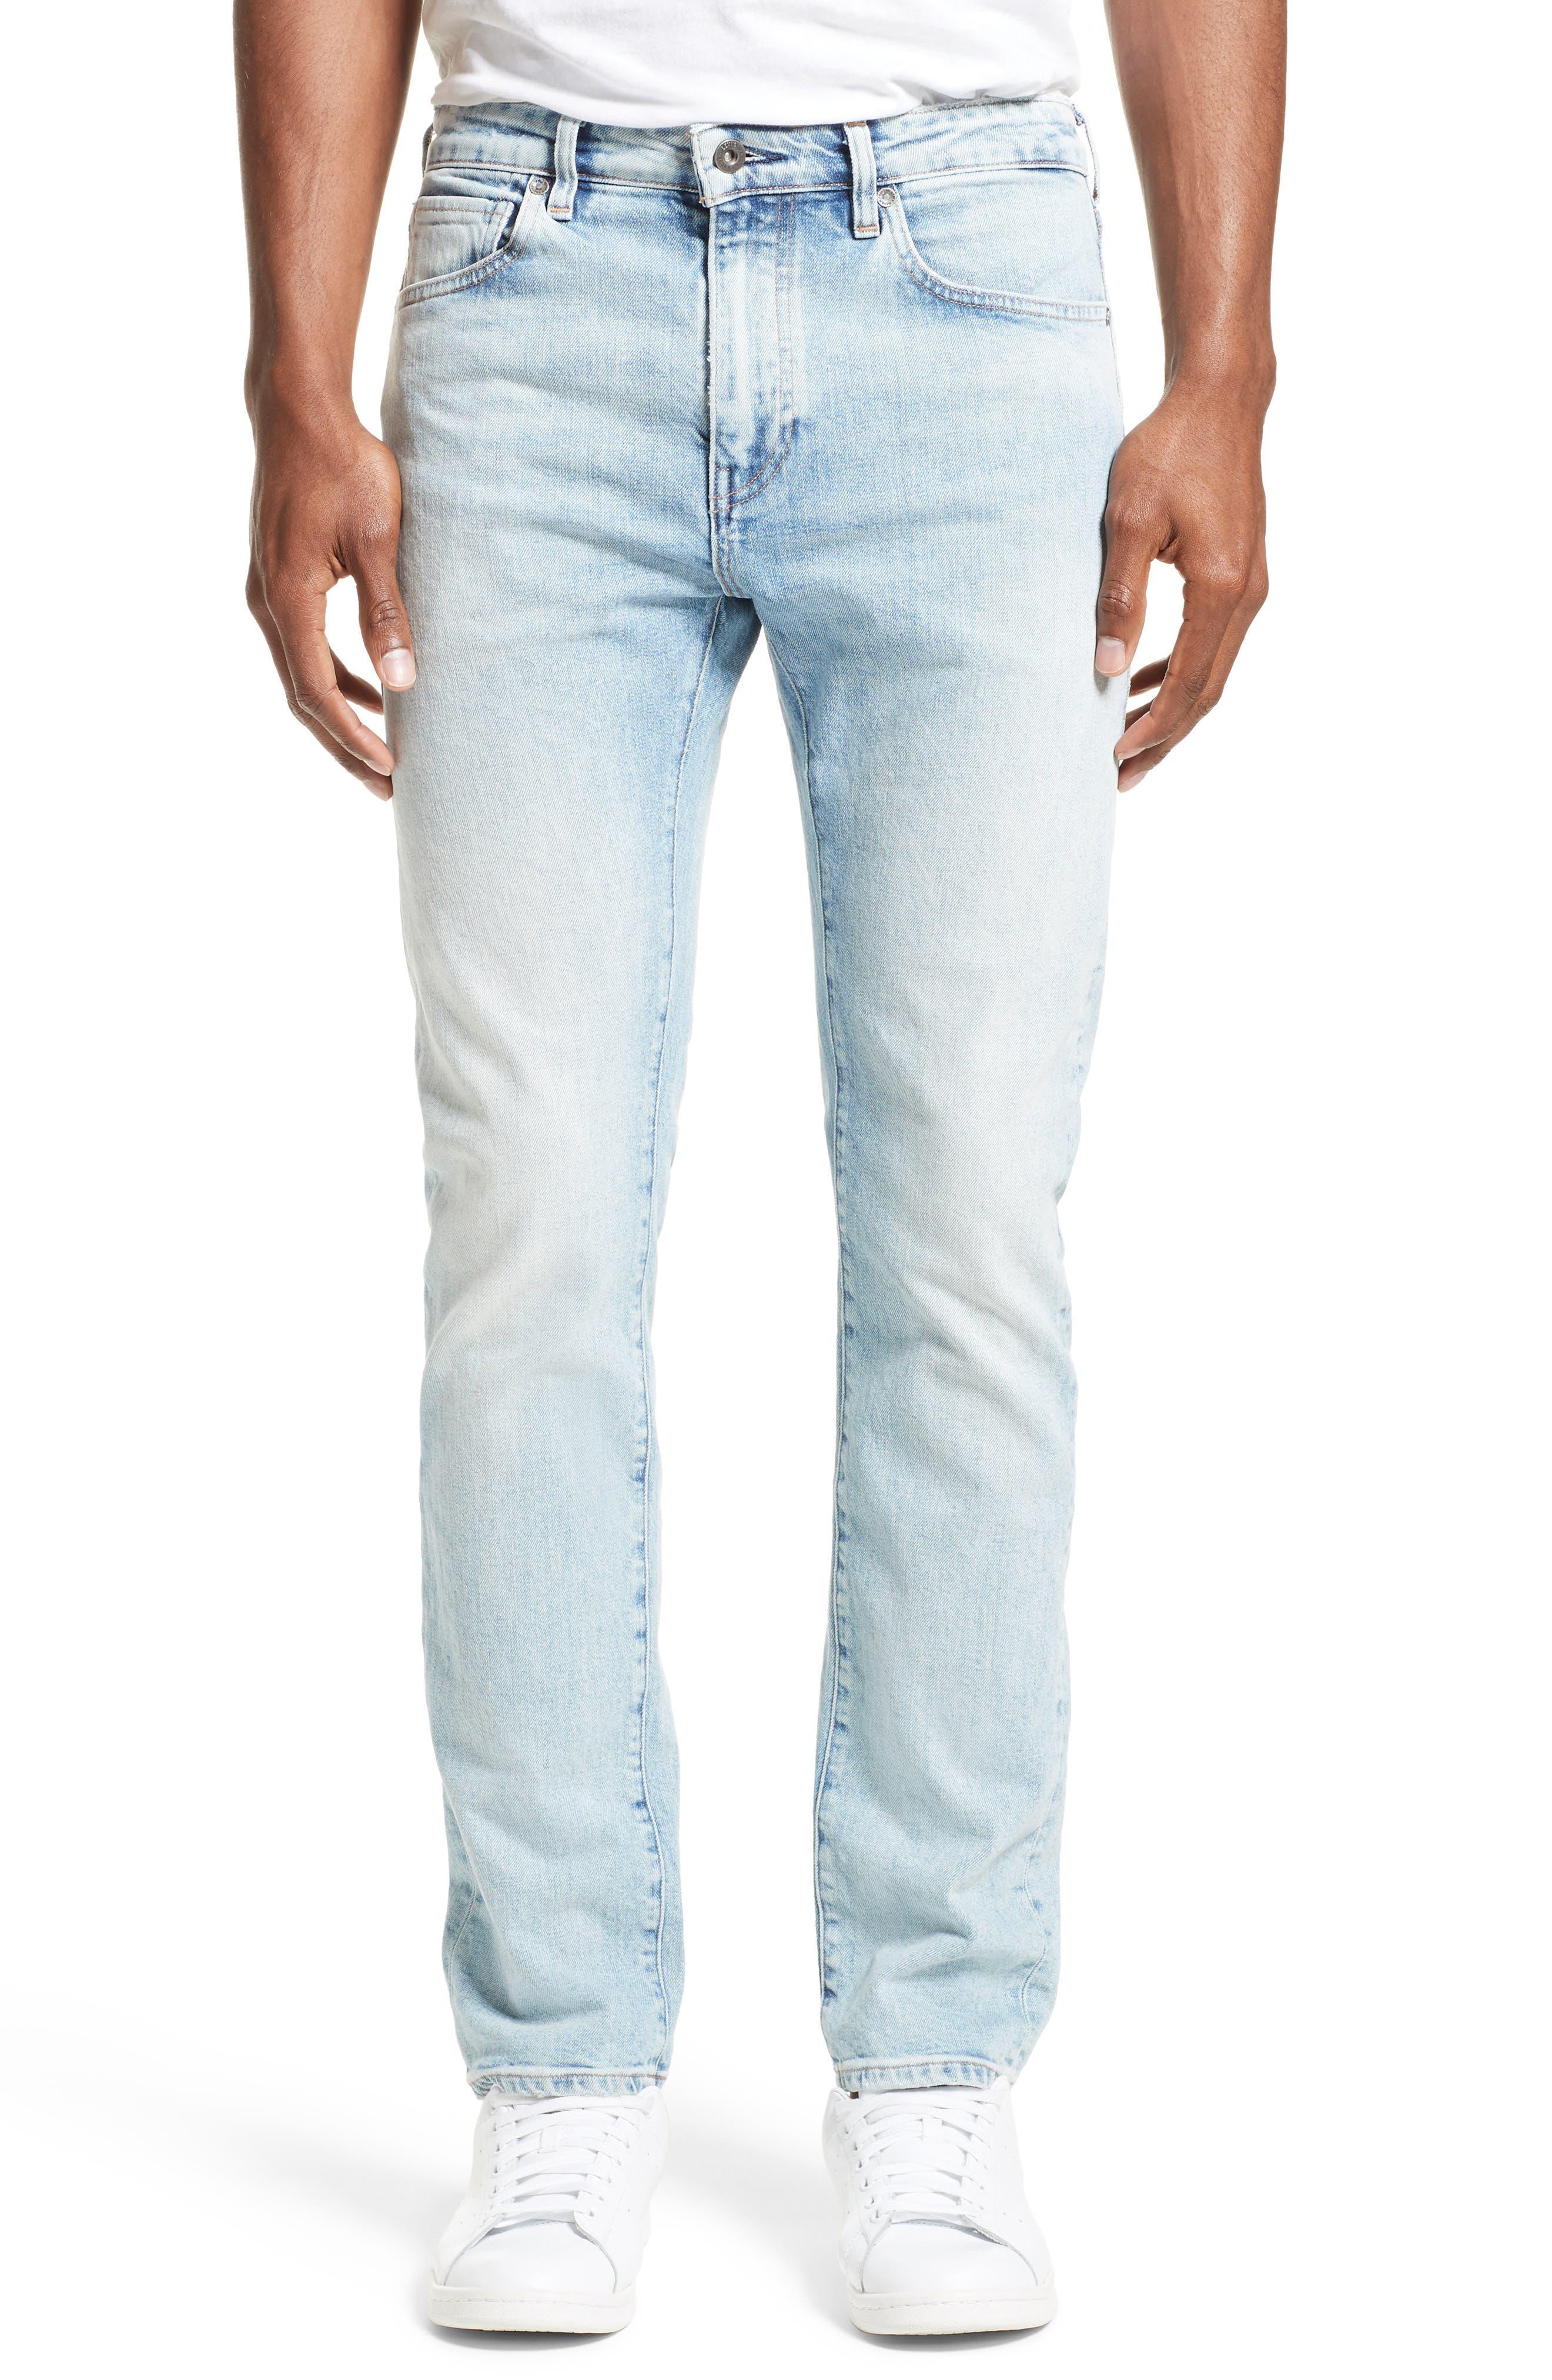 Tack Slim Fit Jeans,                             Main thumbnail 1, color,                             450